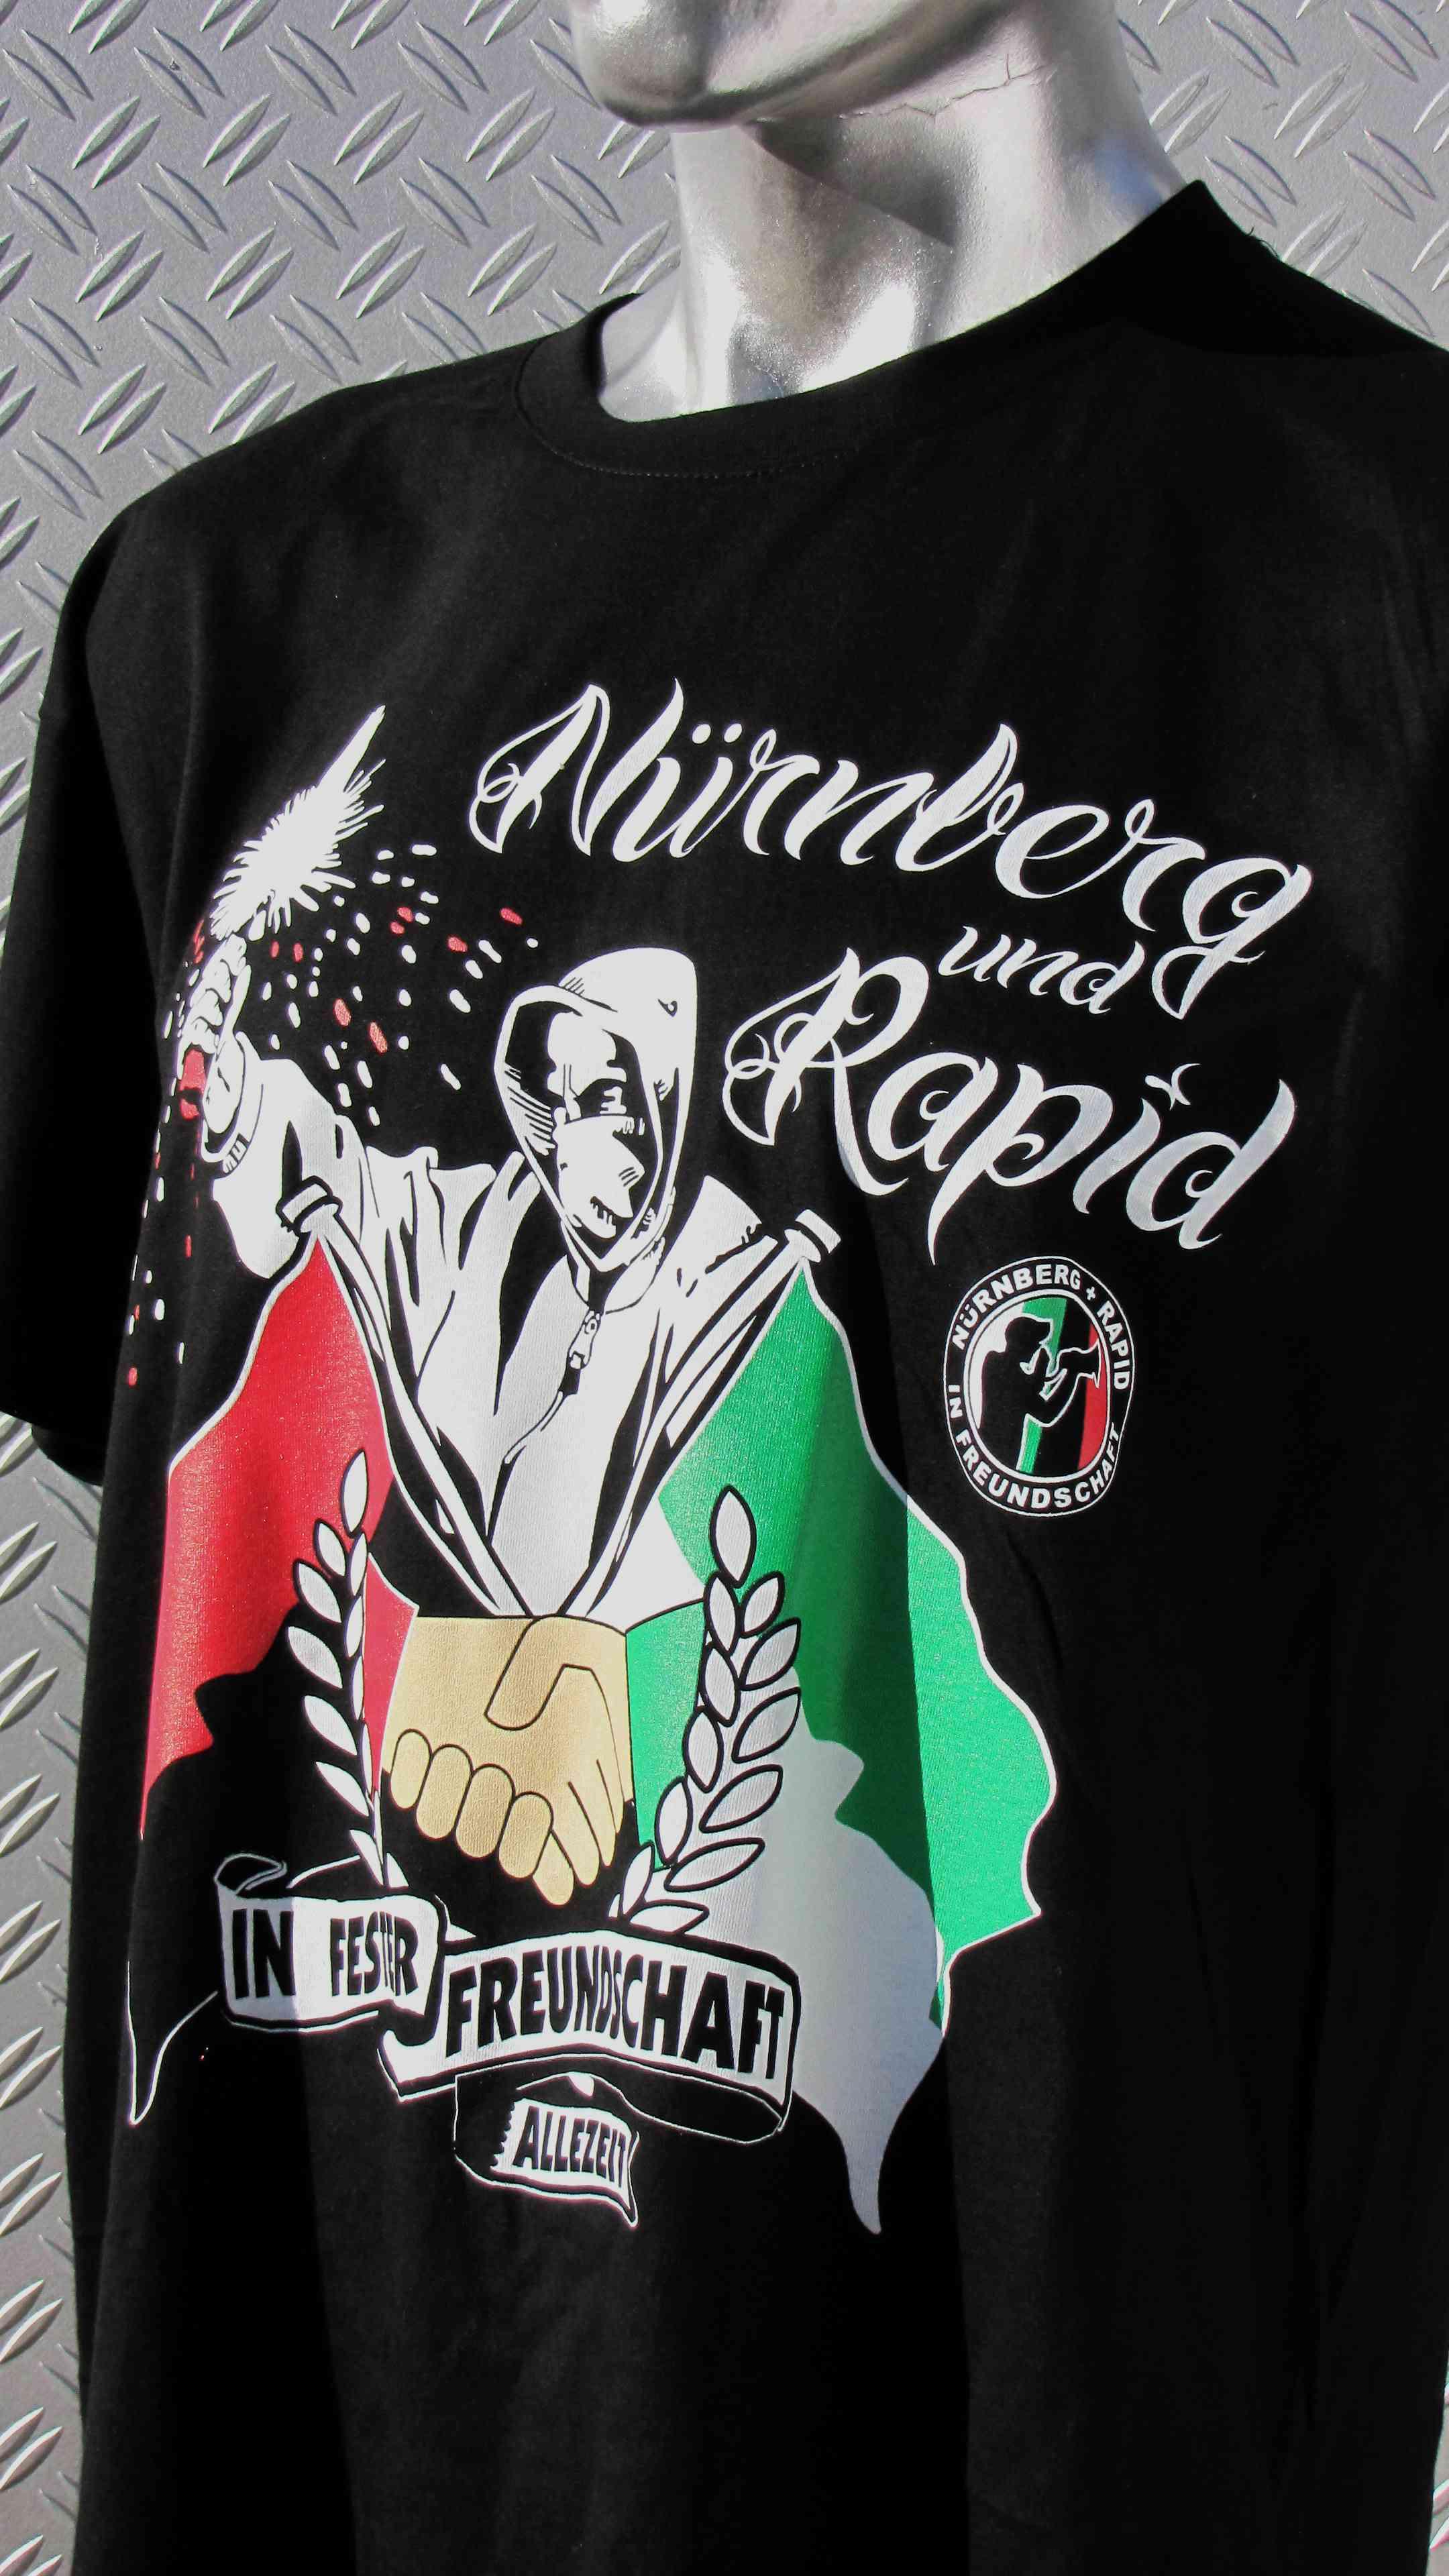 Shirt - Nürnberg & Rapid in fester Freundschaft